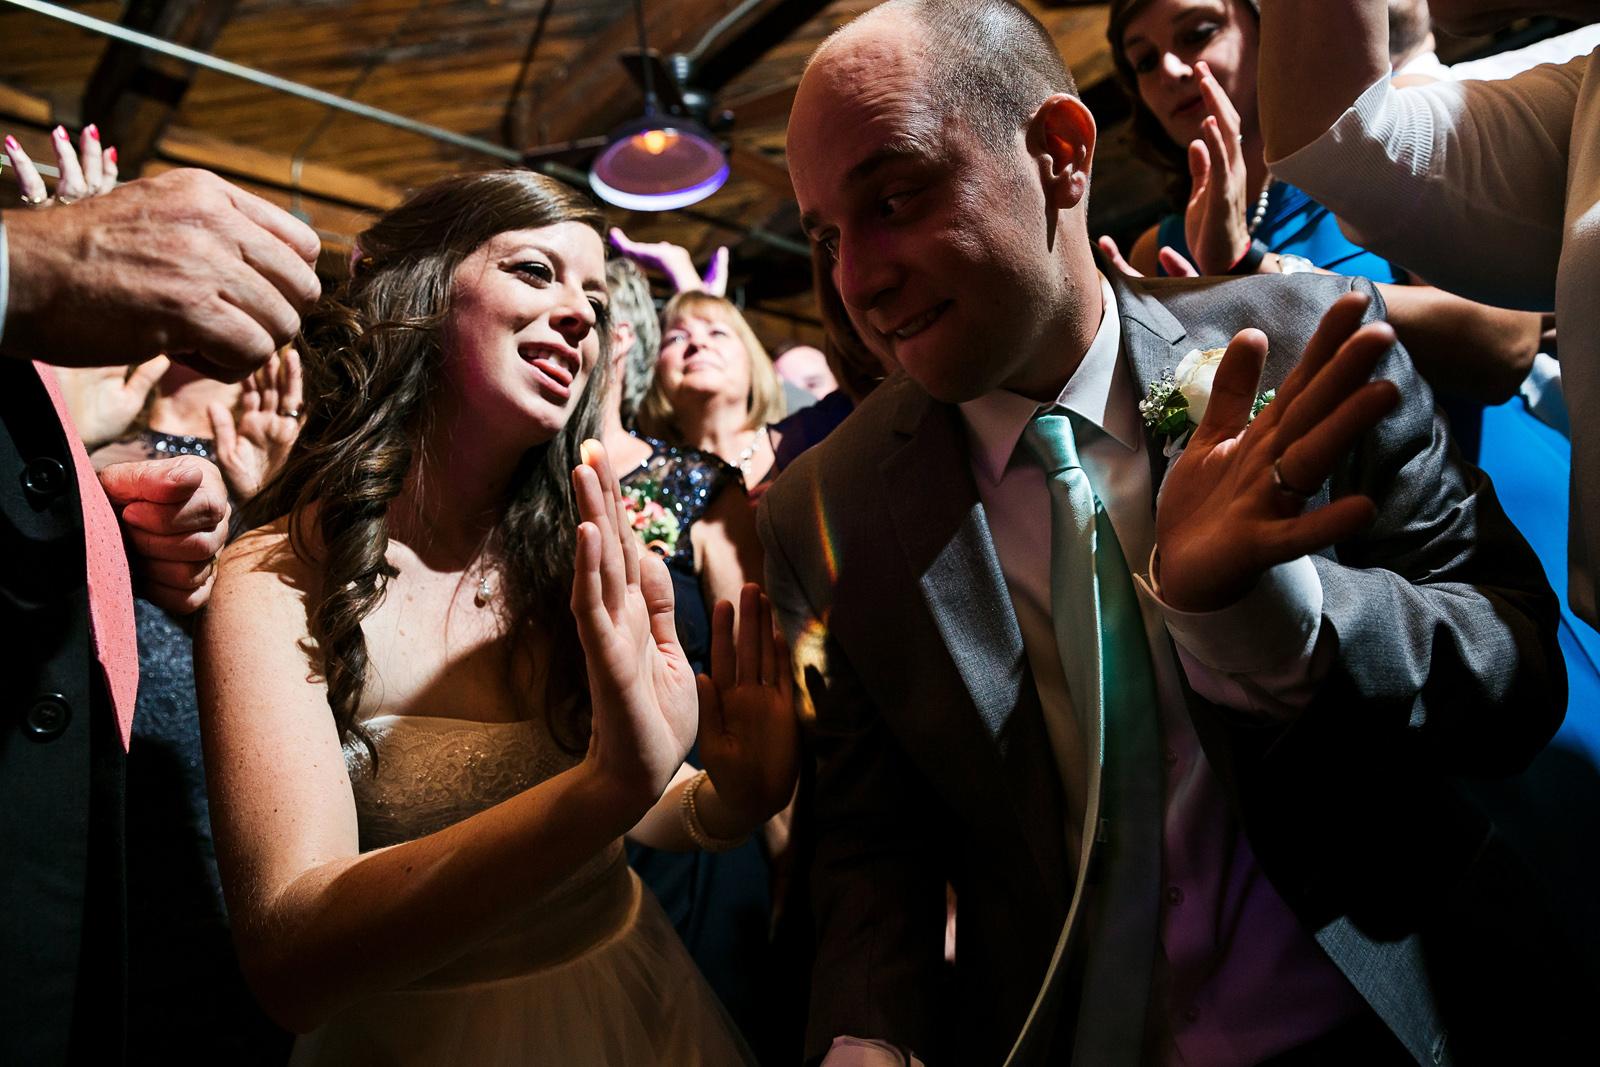 Oldani-Photography-St-Louis-Film-photographer-Schlafly-Tap-Room-Wedding-Reception_20140927_19491509.jpg